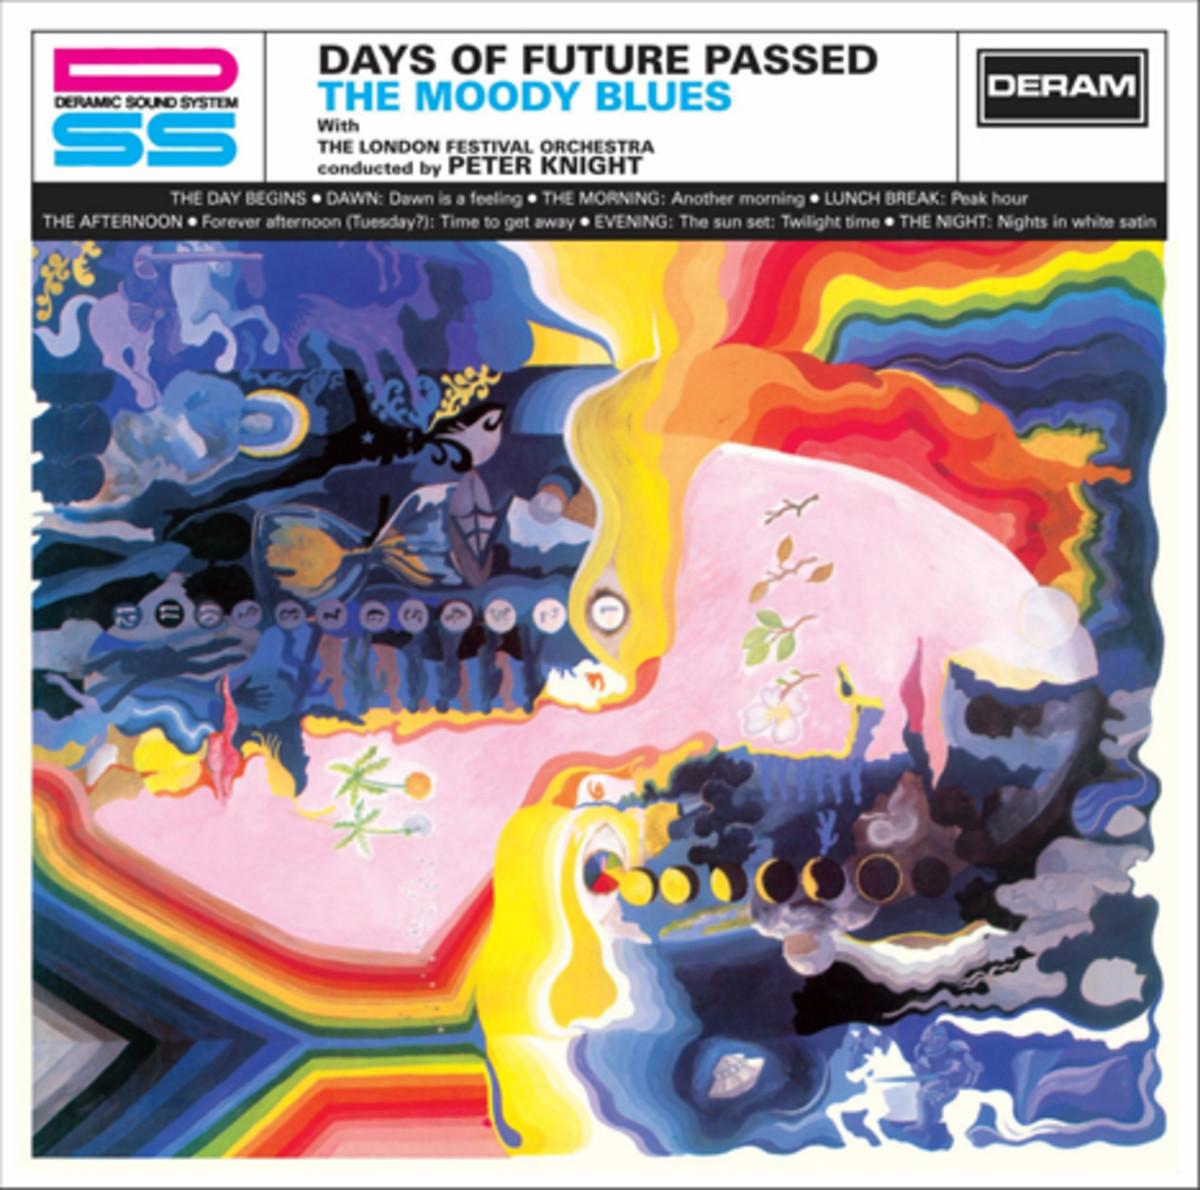 The Moody Blues Days of Future Passed album